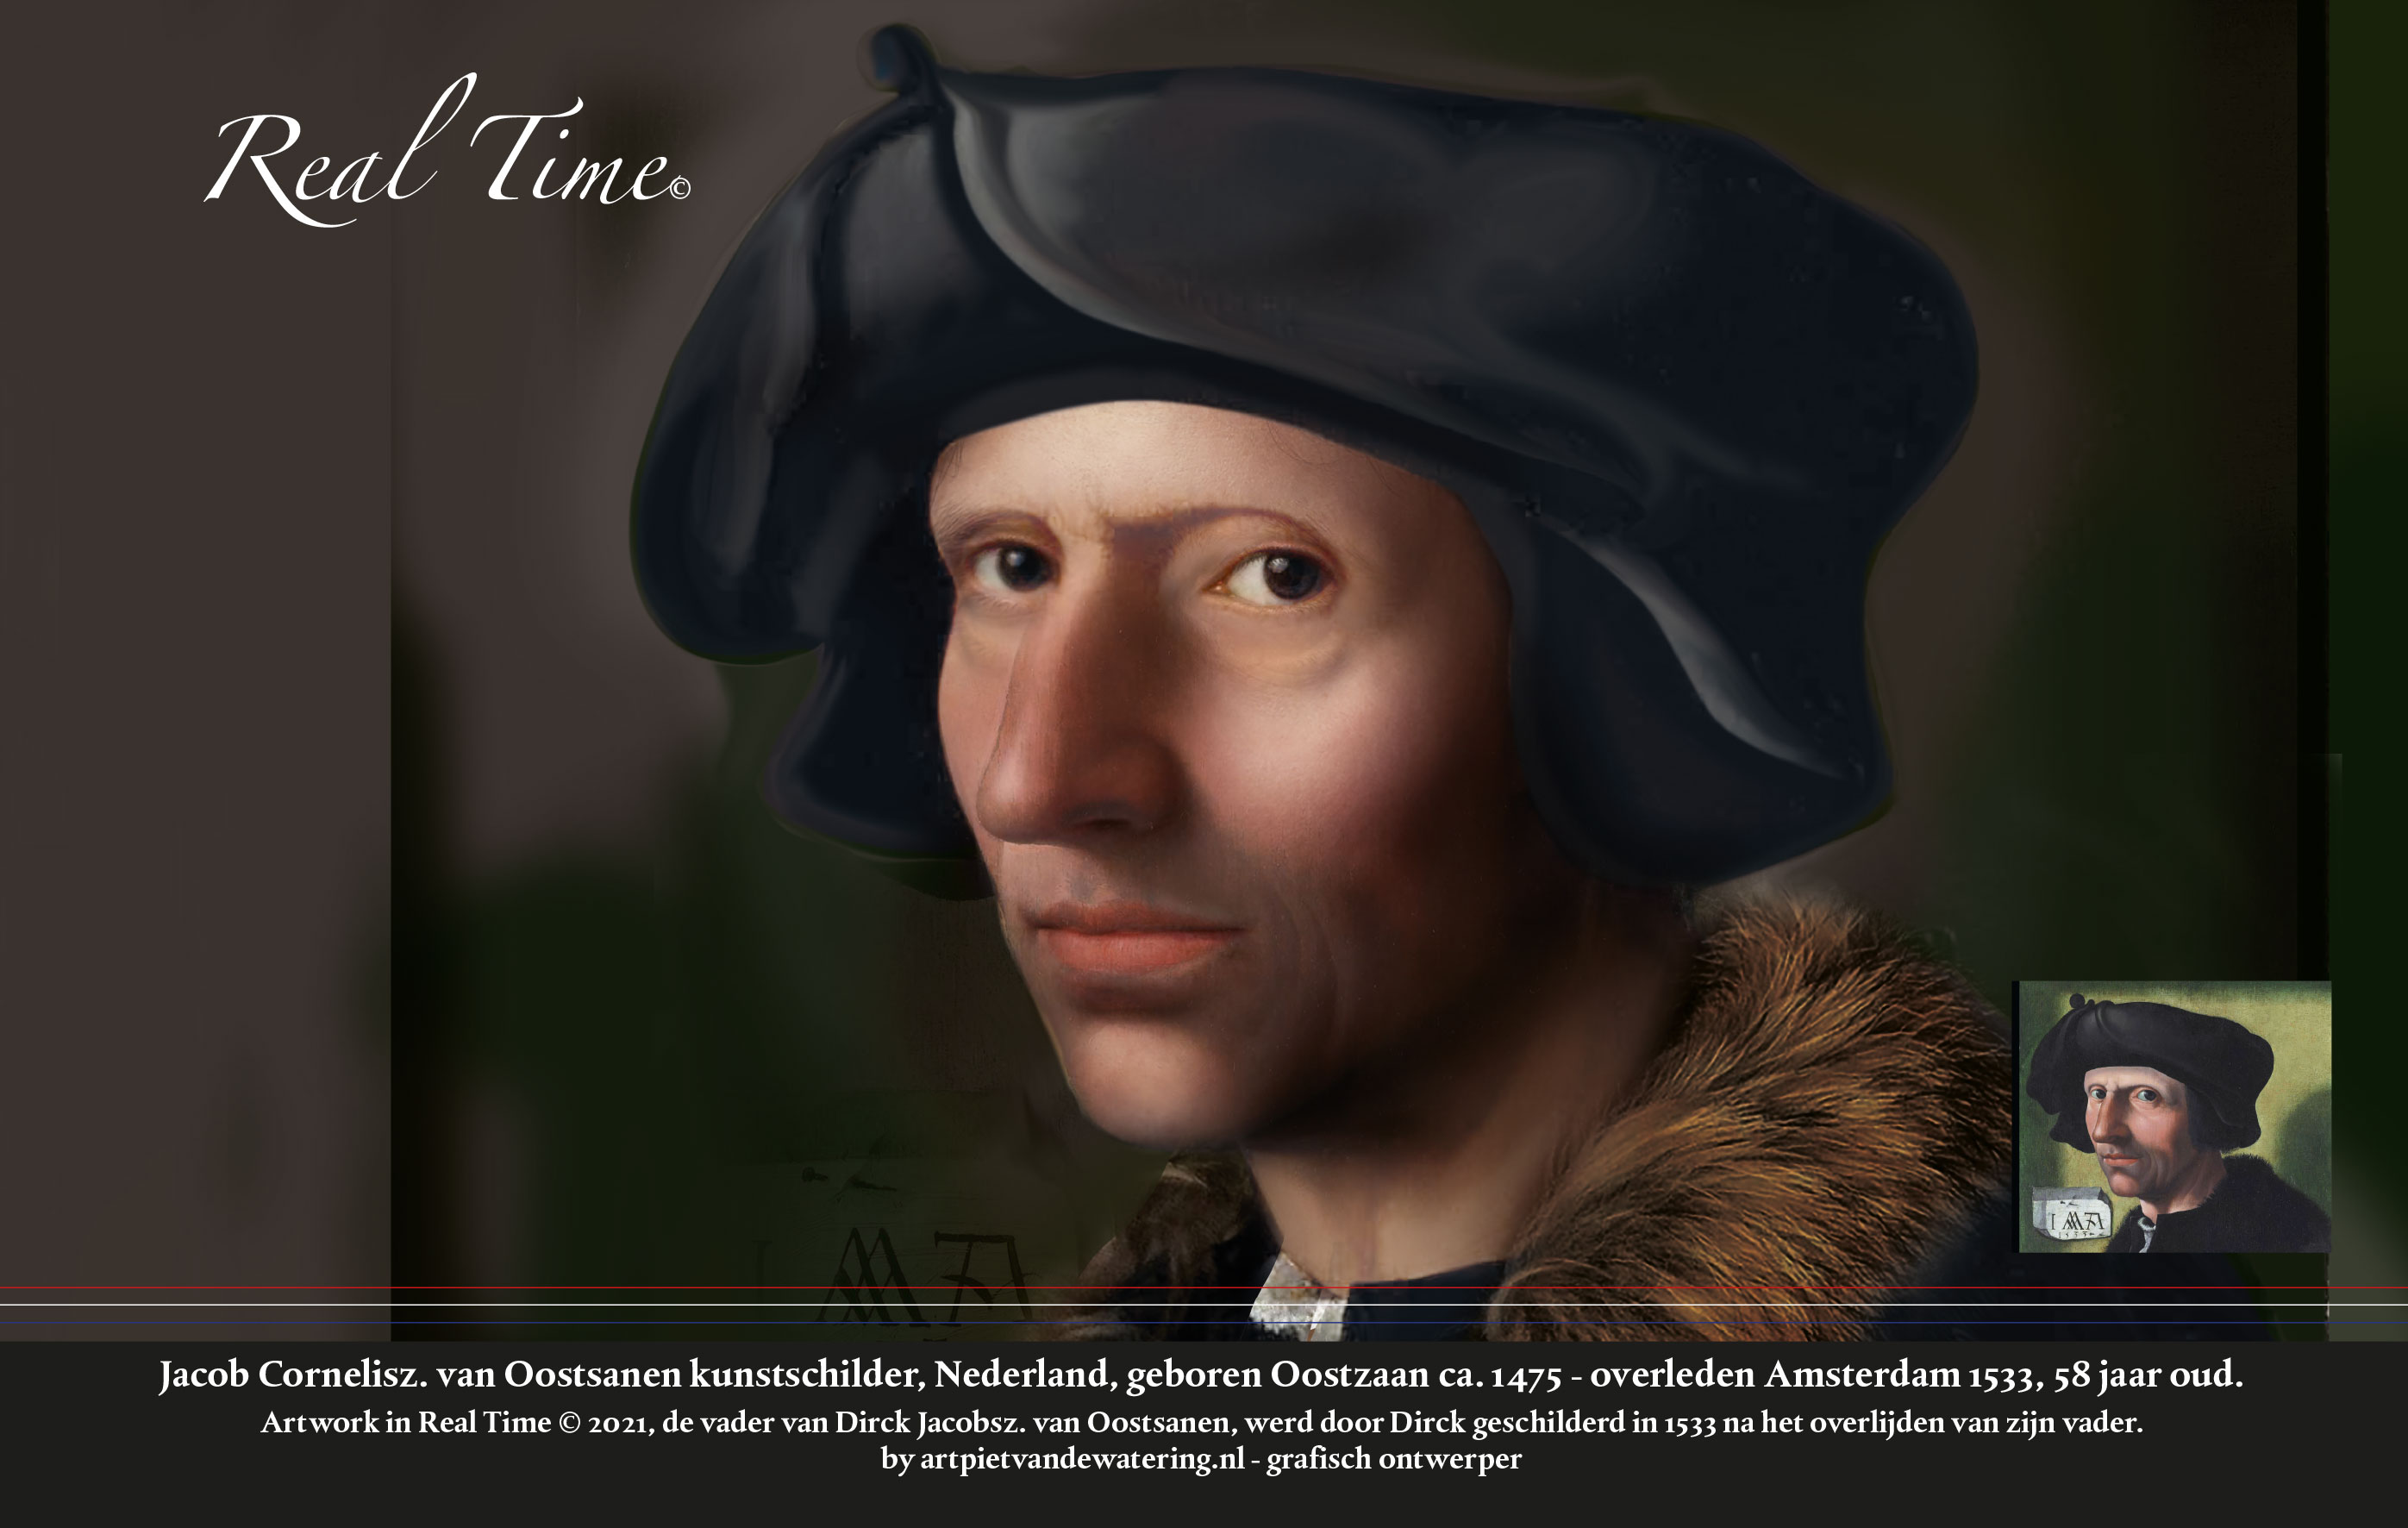 Jacob-Cornelisz.-van-Oostsanen-1475-1533